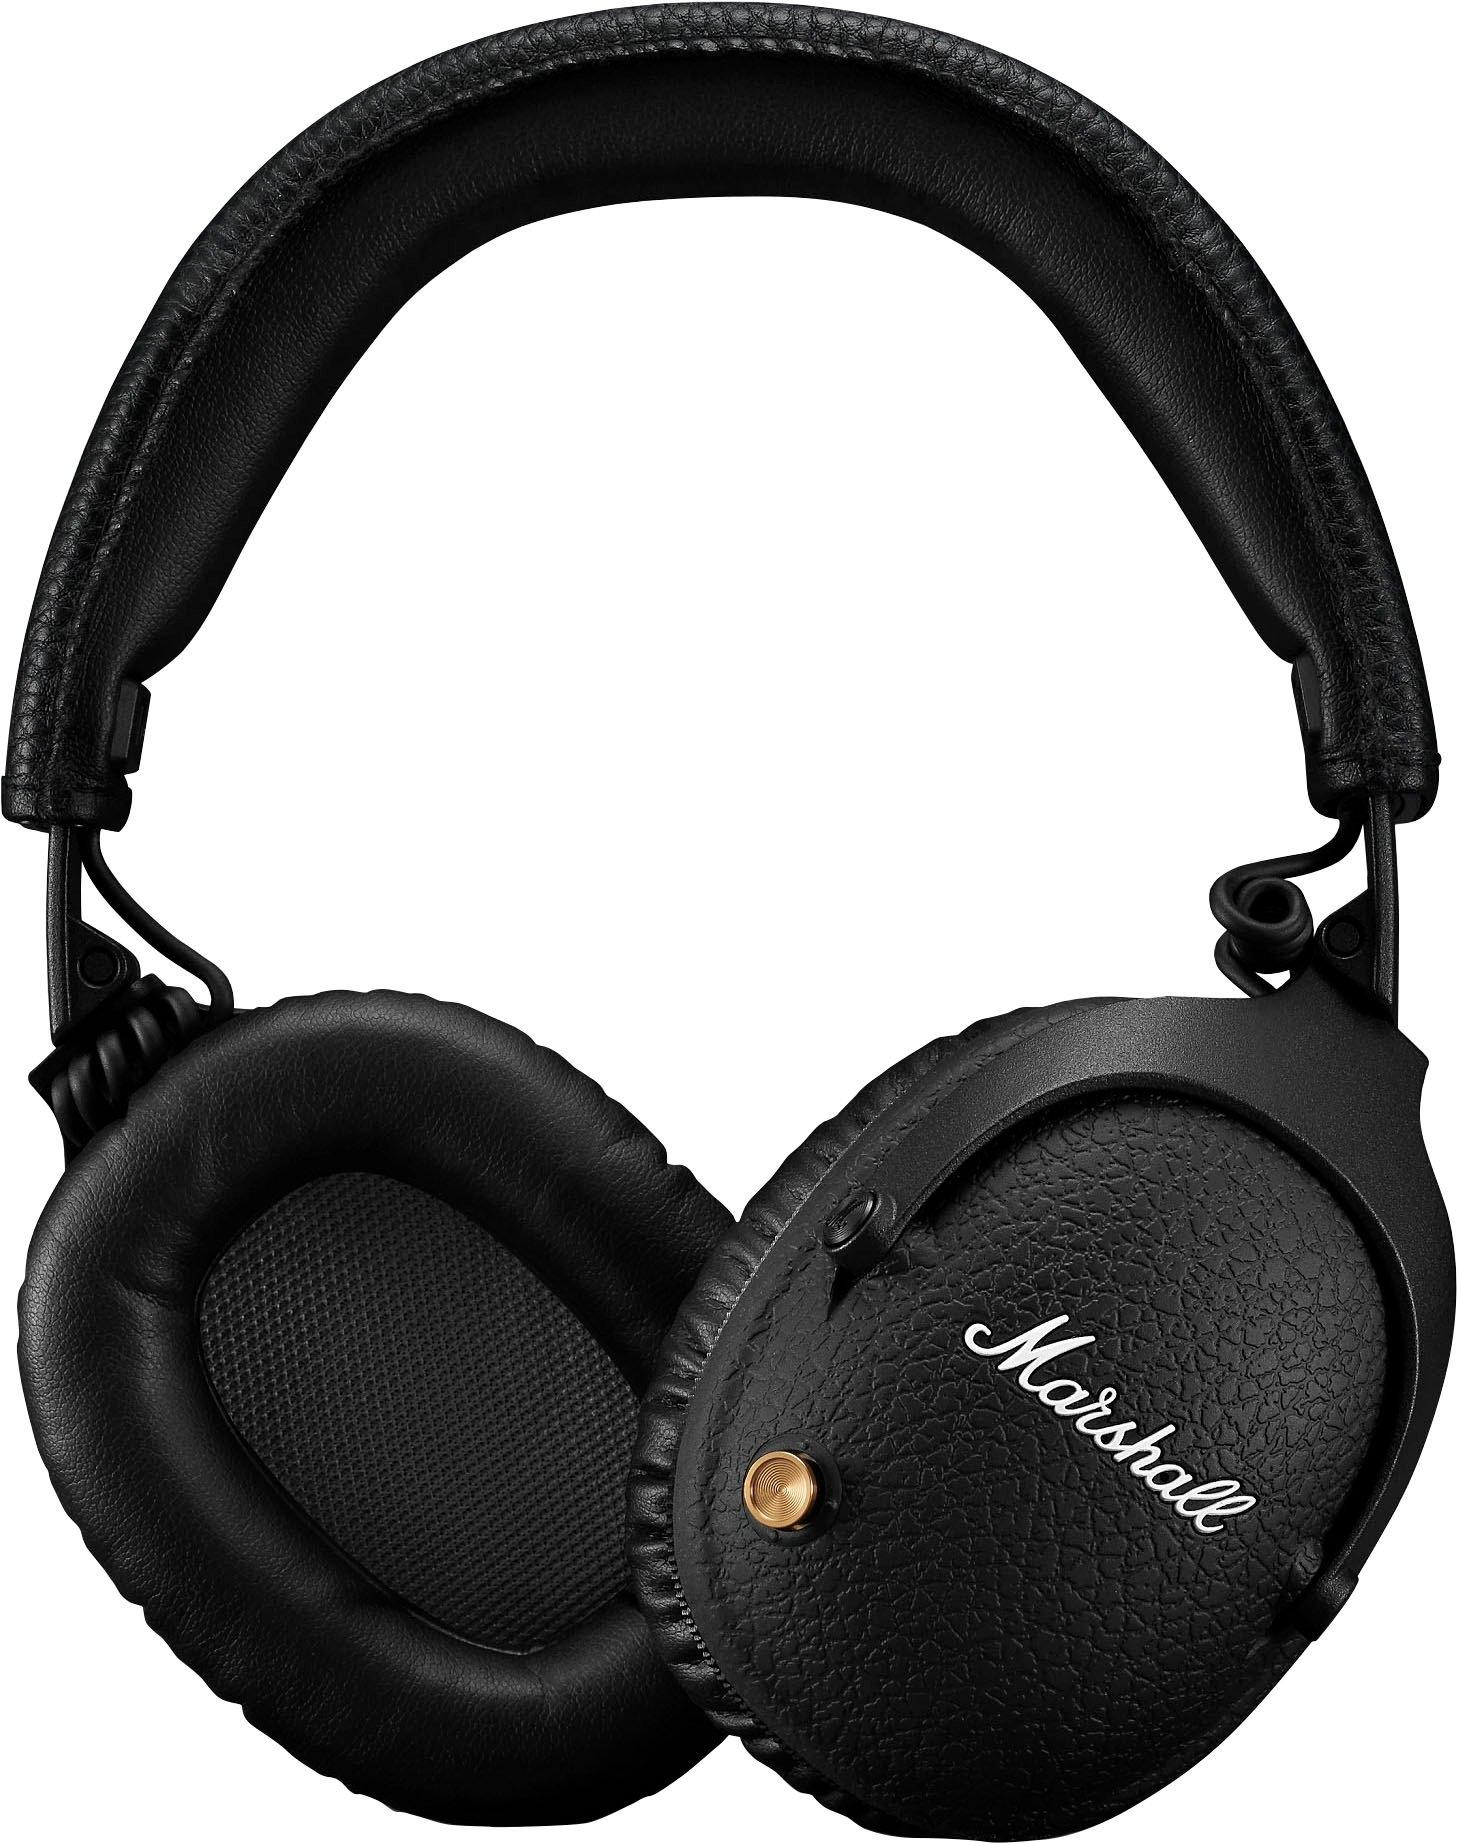 Marshall Bluetooth-hoofdtelefoon MONITOR II A.N.C. in de webshop van OTTO kopen